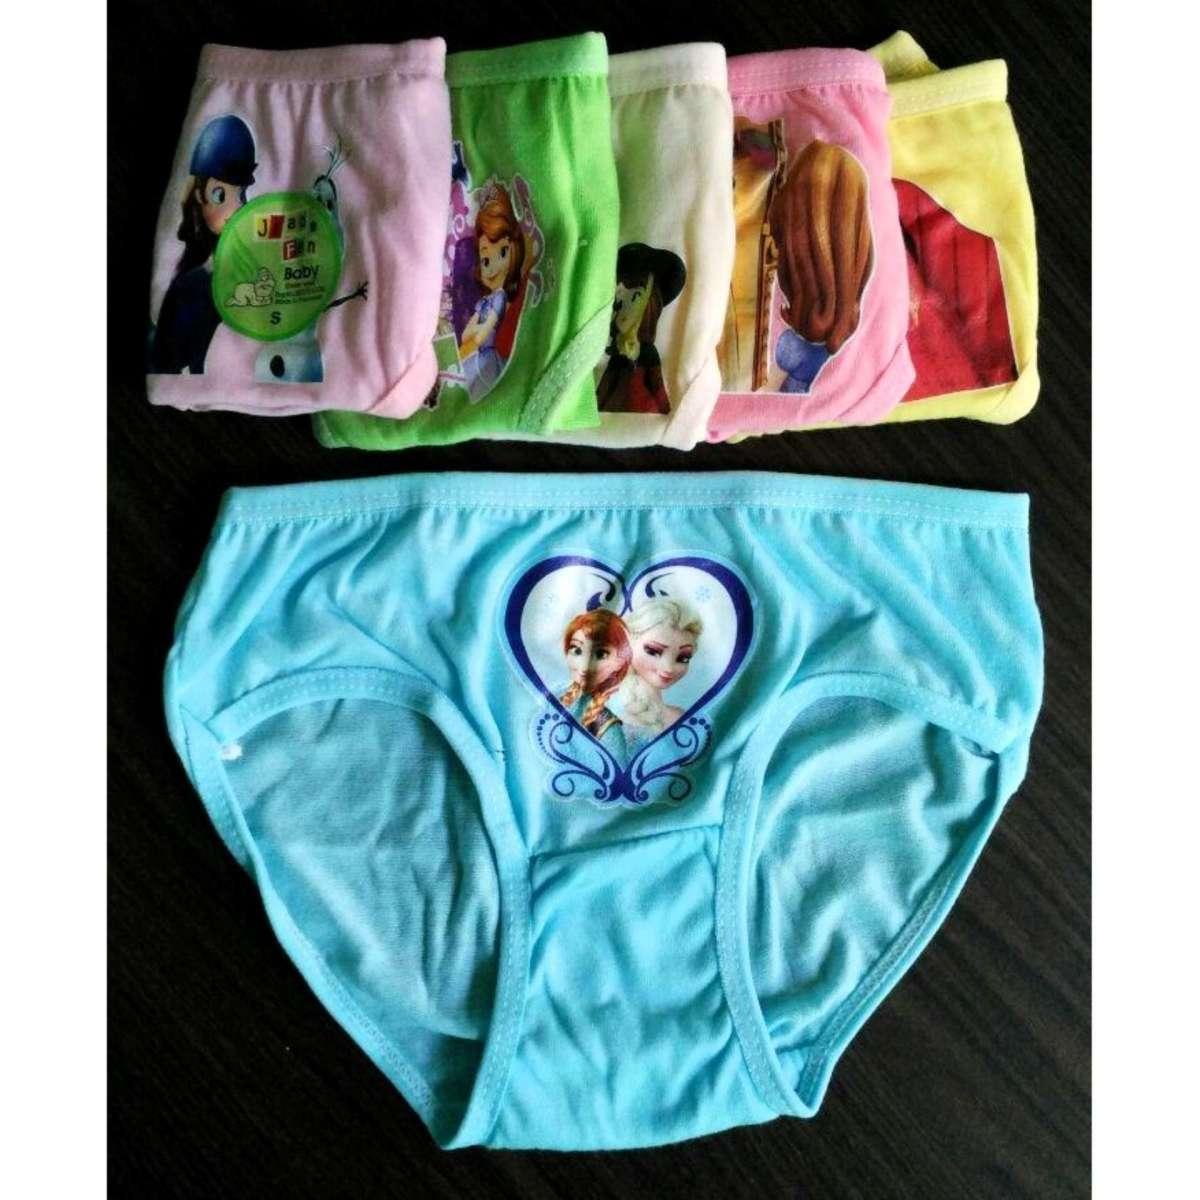 6 Pcs Celana Dalam / Sempak Anak Perempuan Motif Princes Gabriels Store By Gabriels Store.